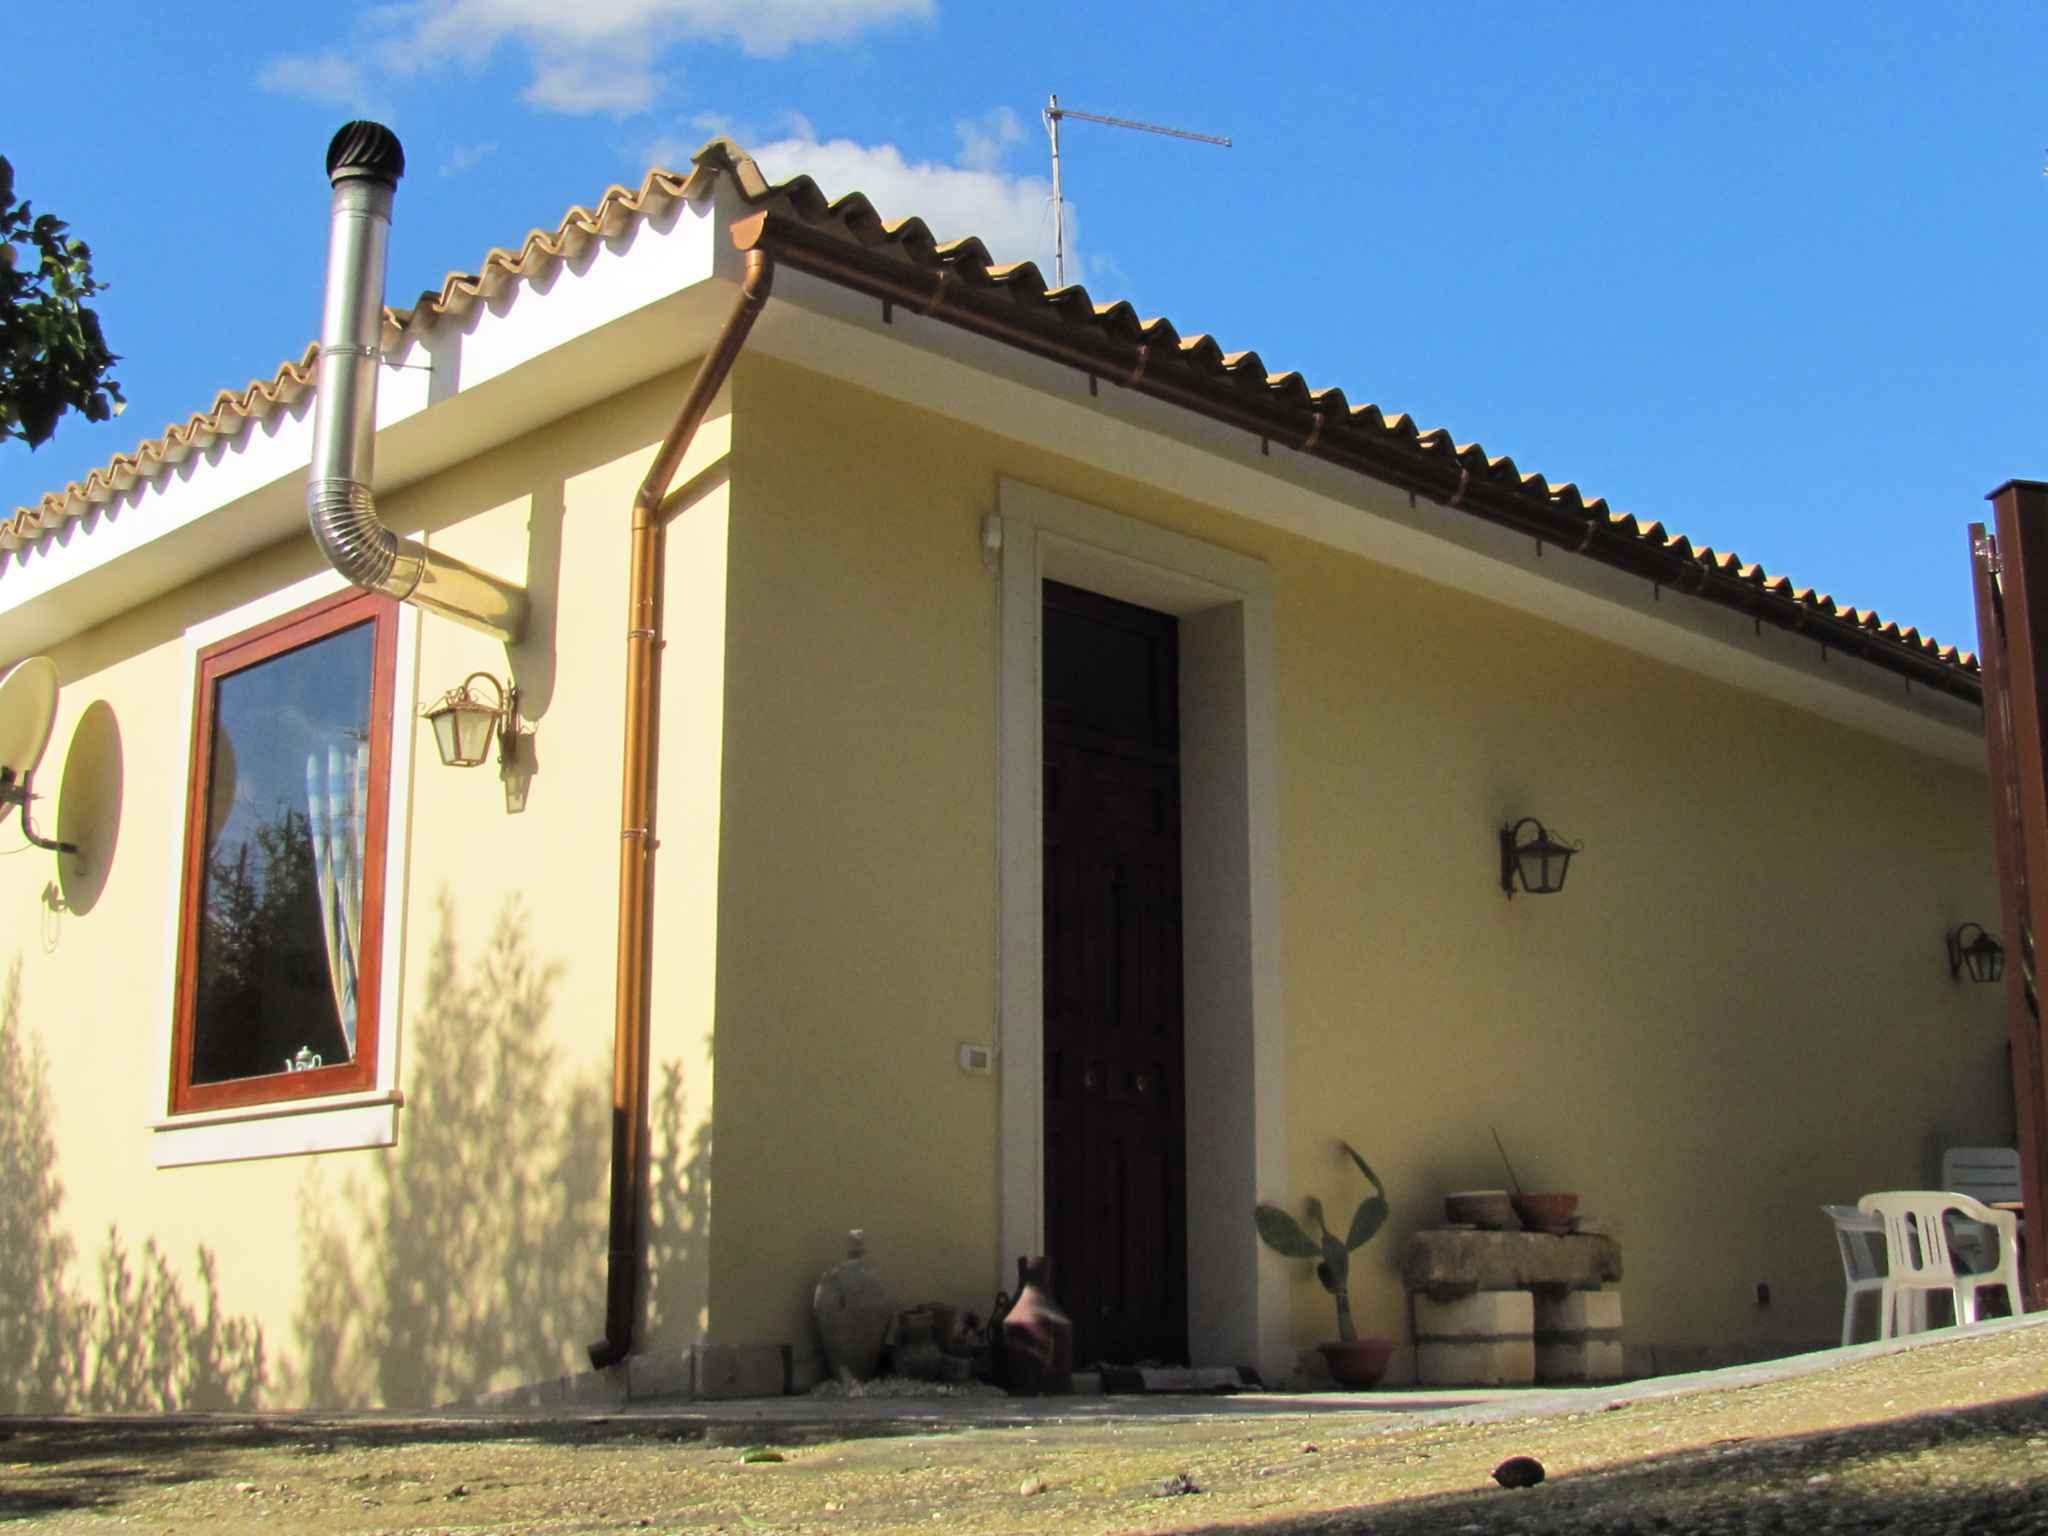 Maison de vacances mit Blick auf Zitronengarten (317534), Lido di Noto, Siracusa, Sicile, Italie, image 4